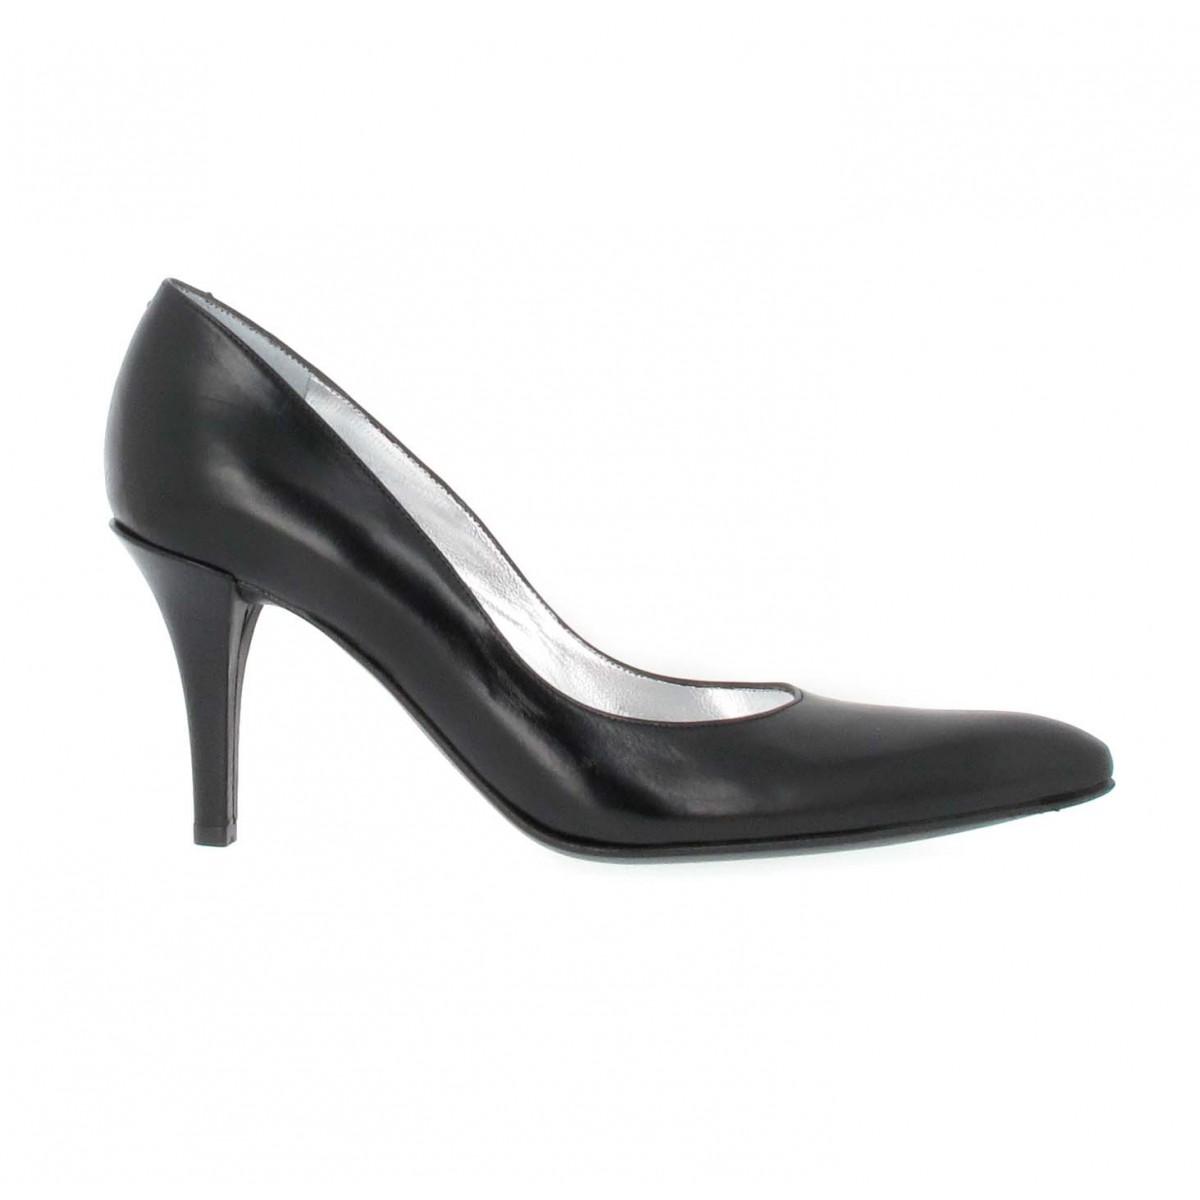 a9f1946991ff32 Free lance jaspe 7 cuir femme noir   Fanny chaussures